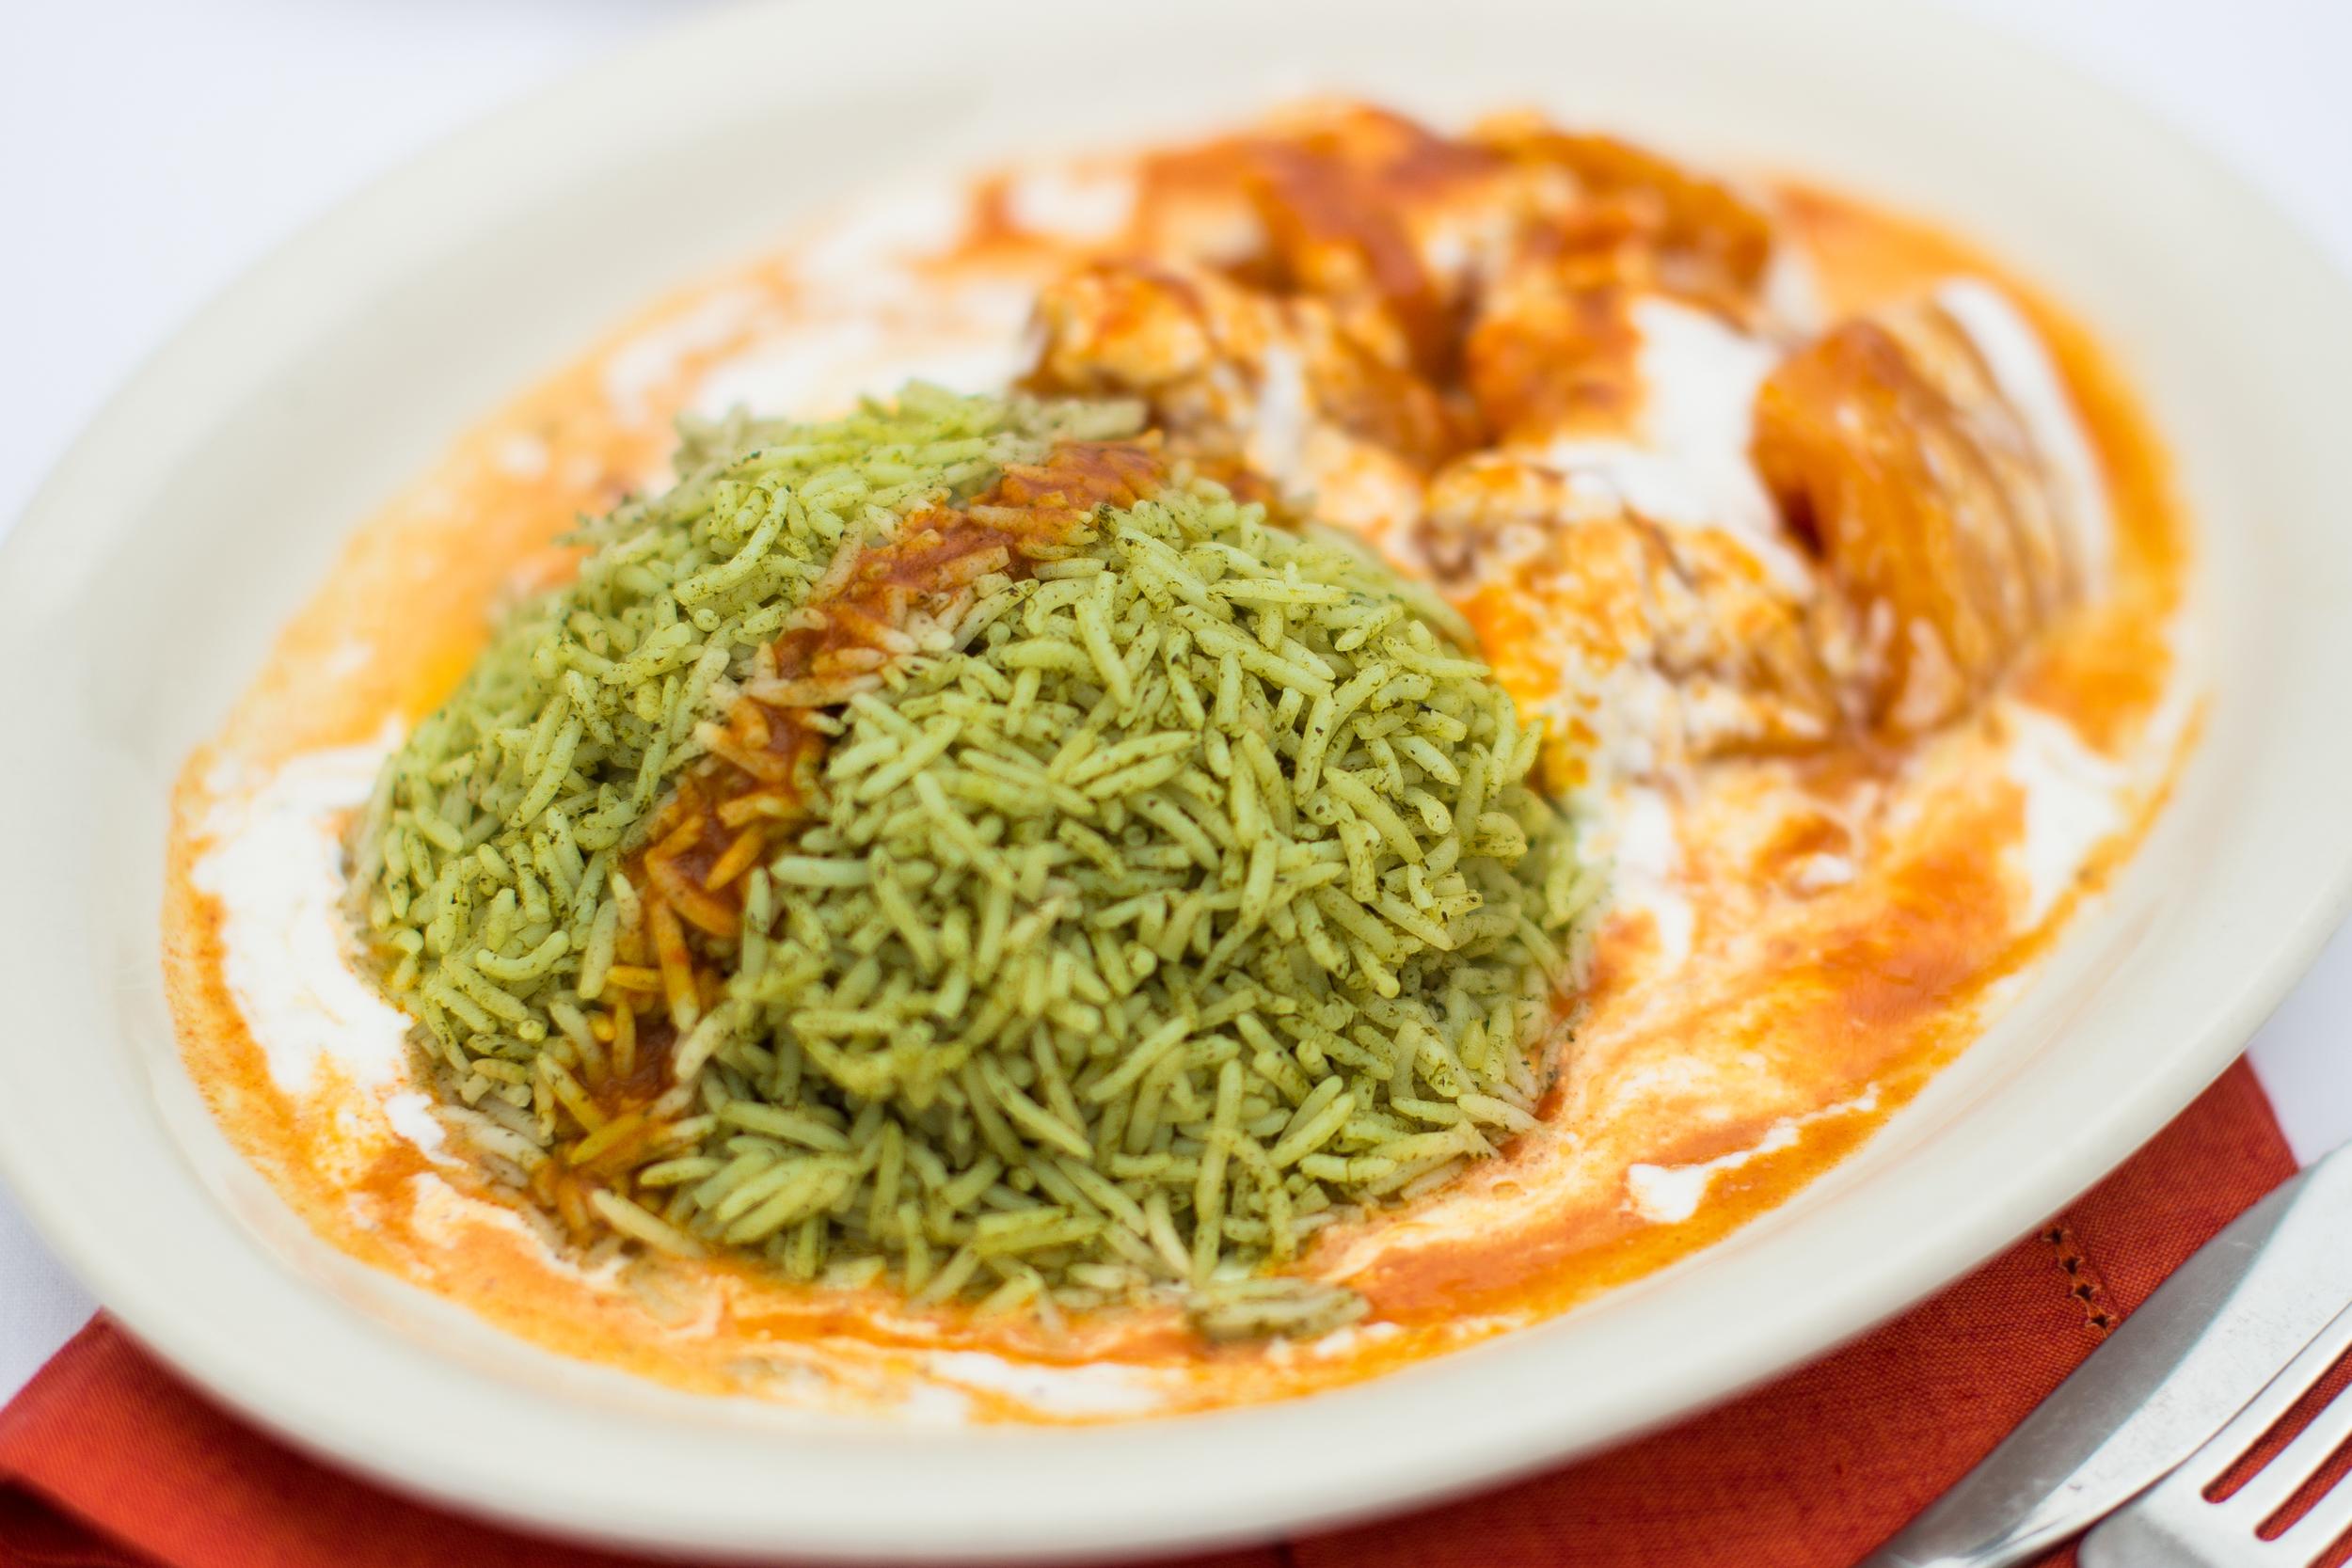 Panjshir-Cam-2-horizontal-3-nabu-food-photography.jpg